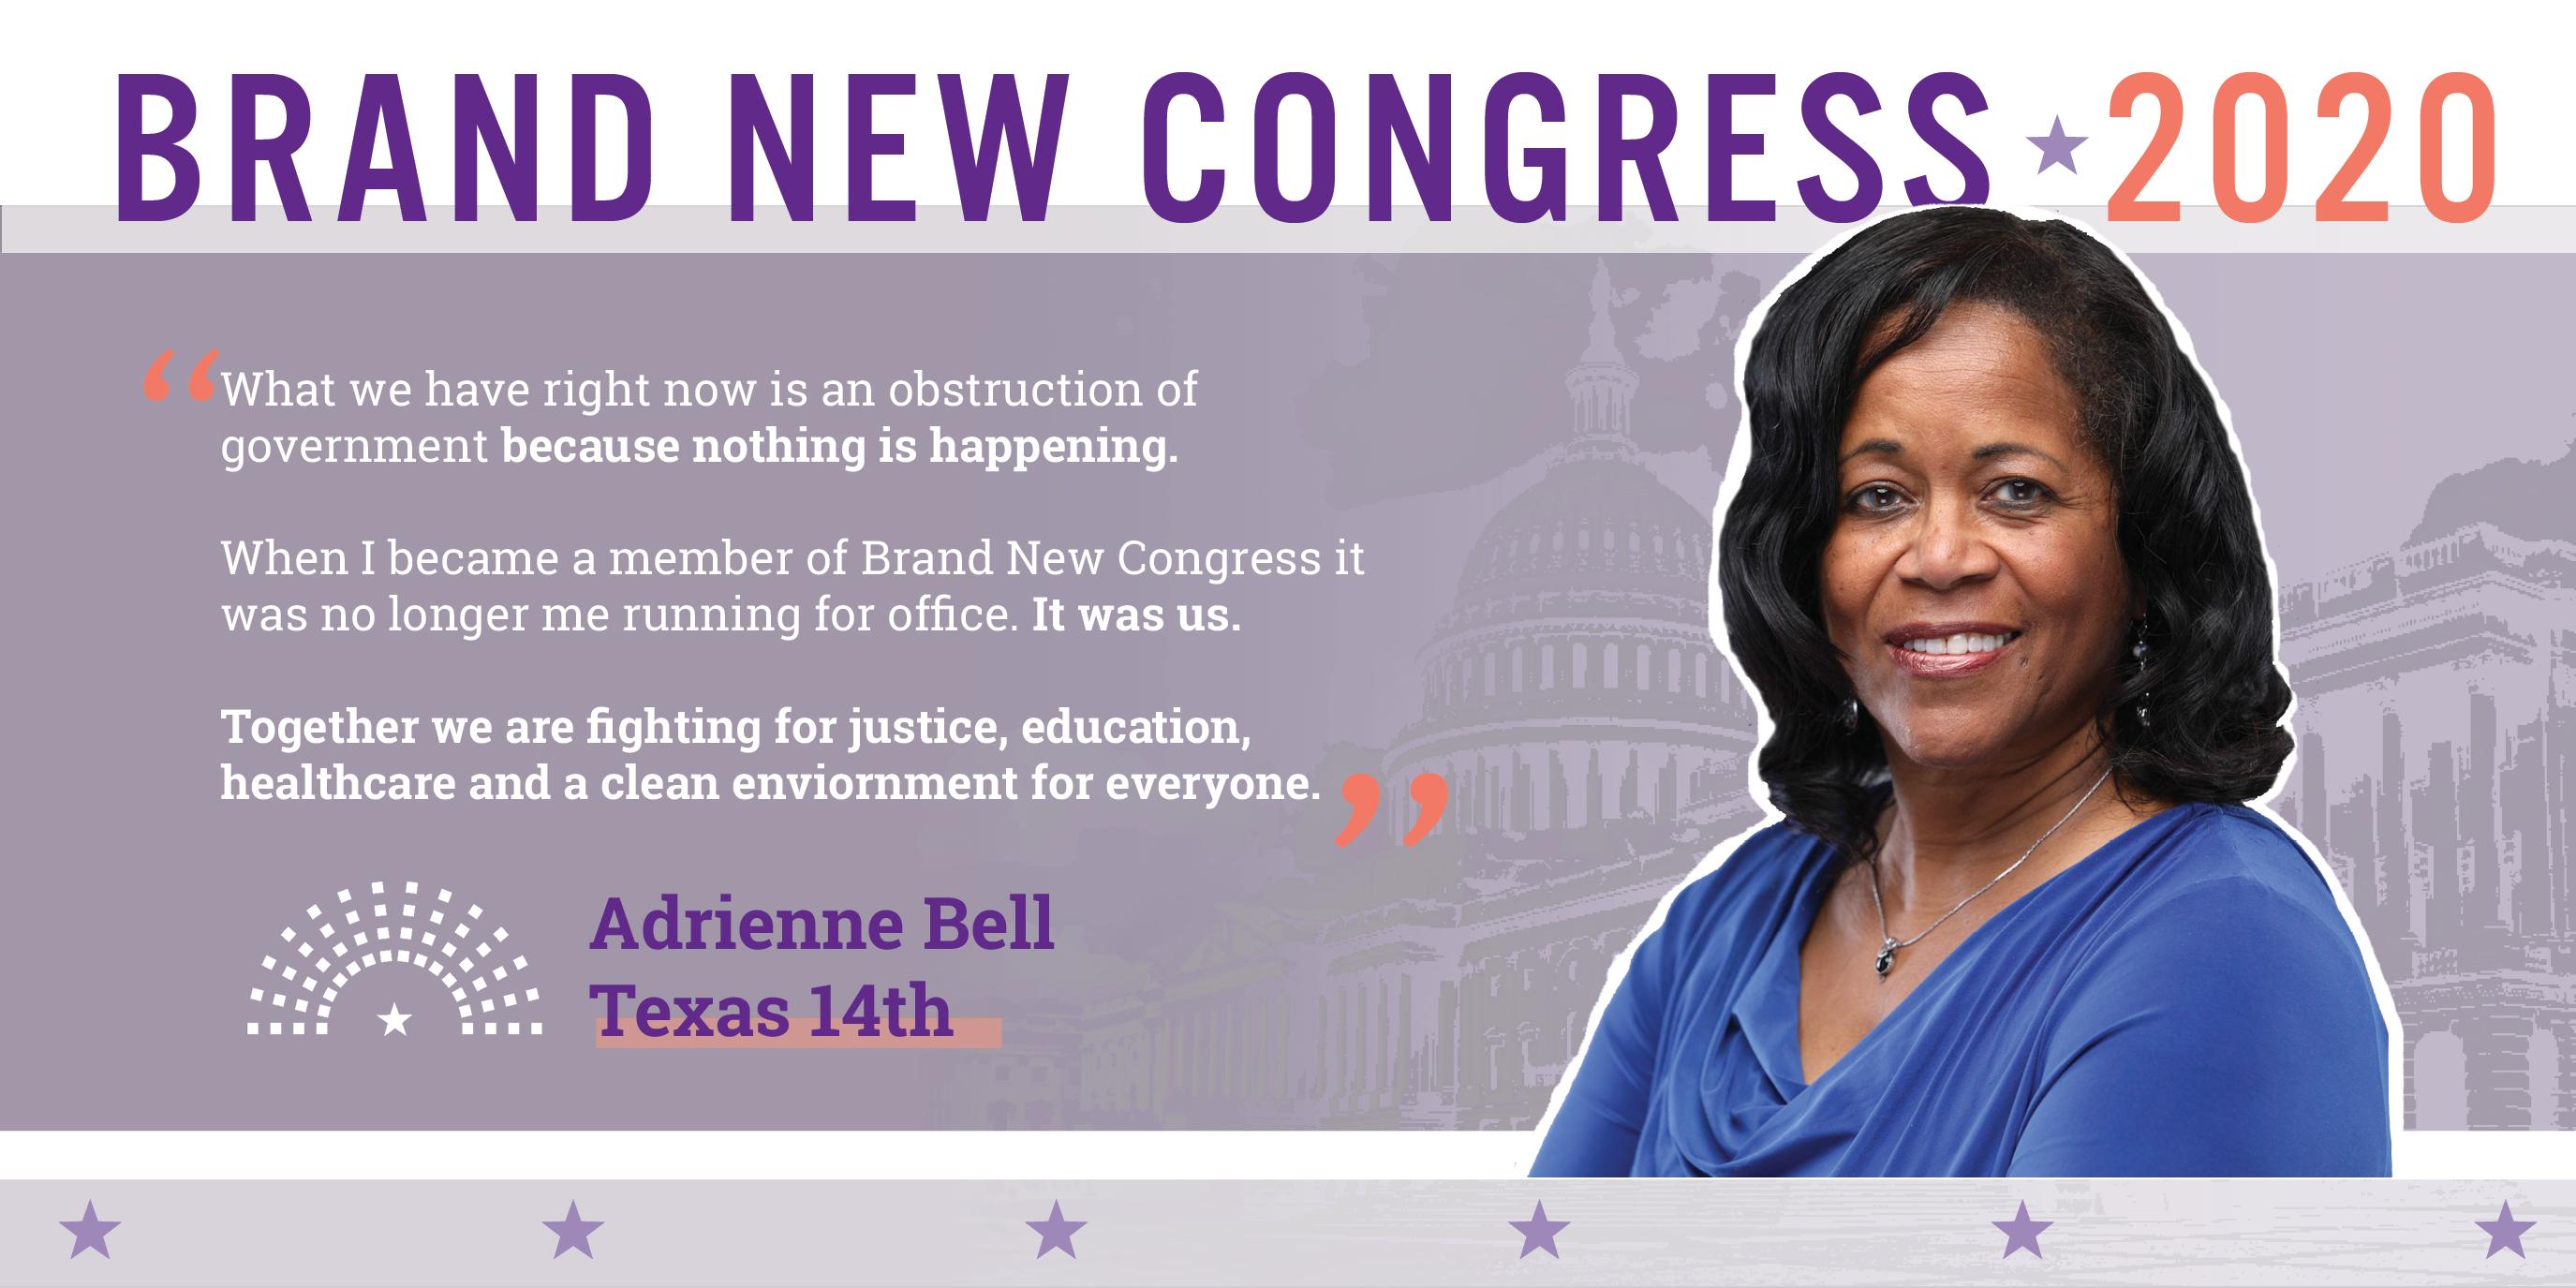 Adrienne Bell Brand New Congress